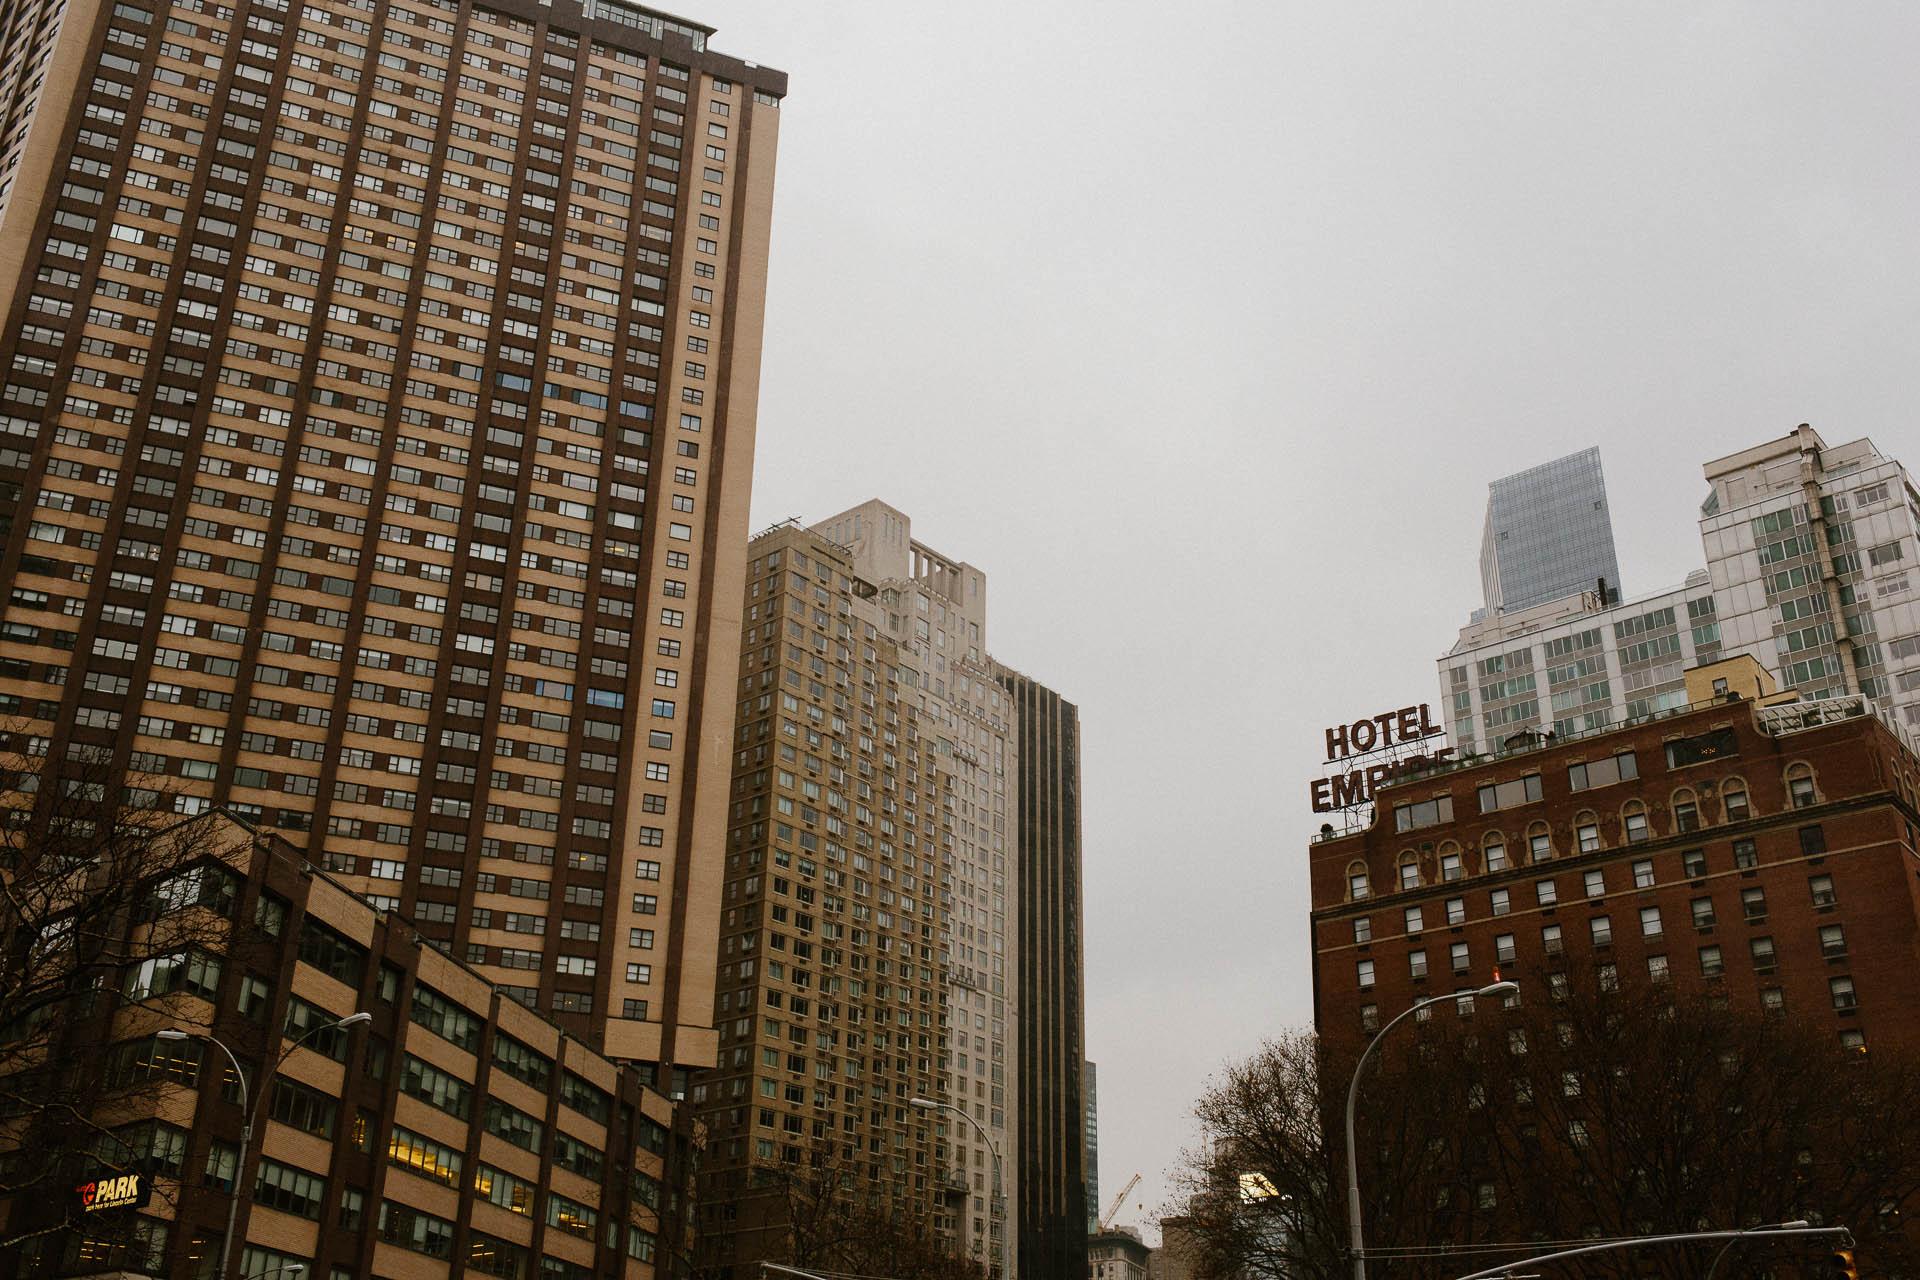 New york city flavie nelly french wedding photographer